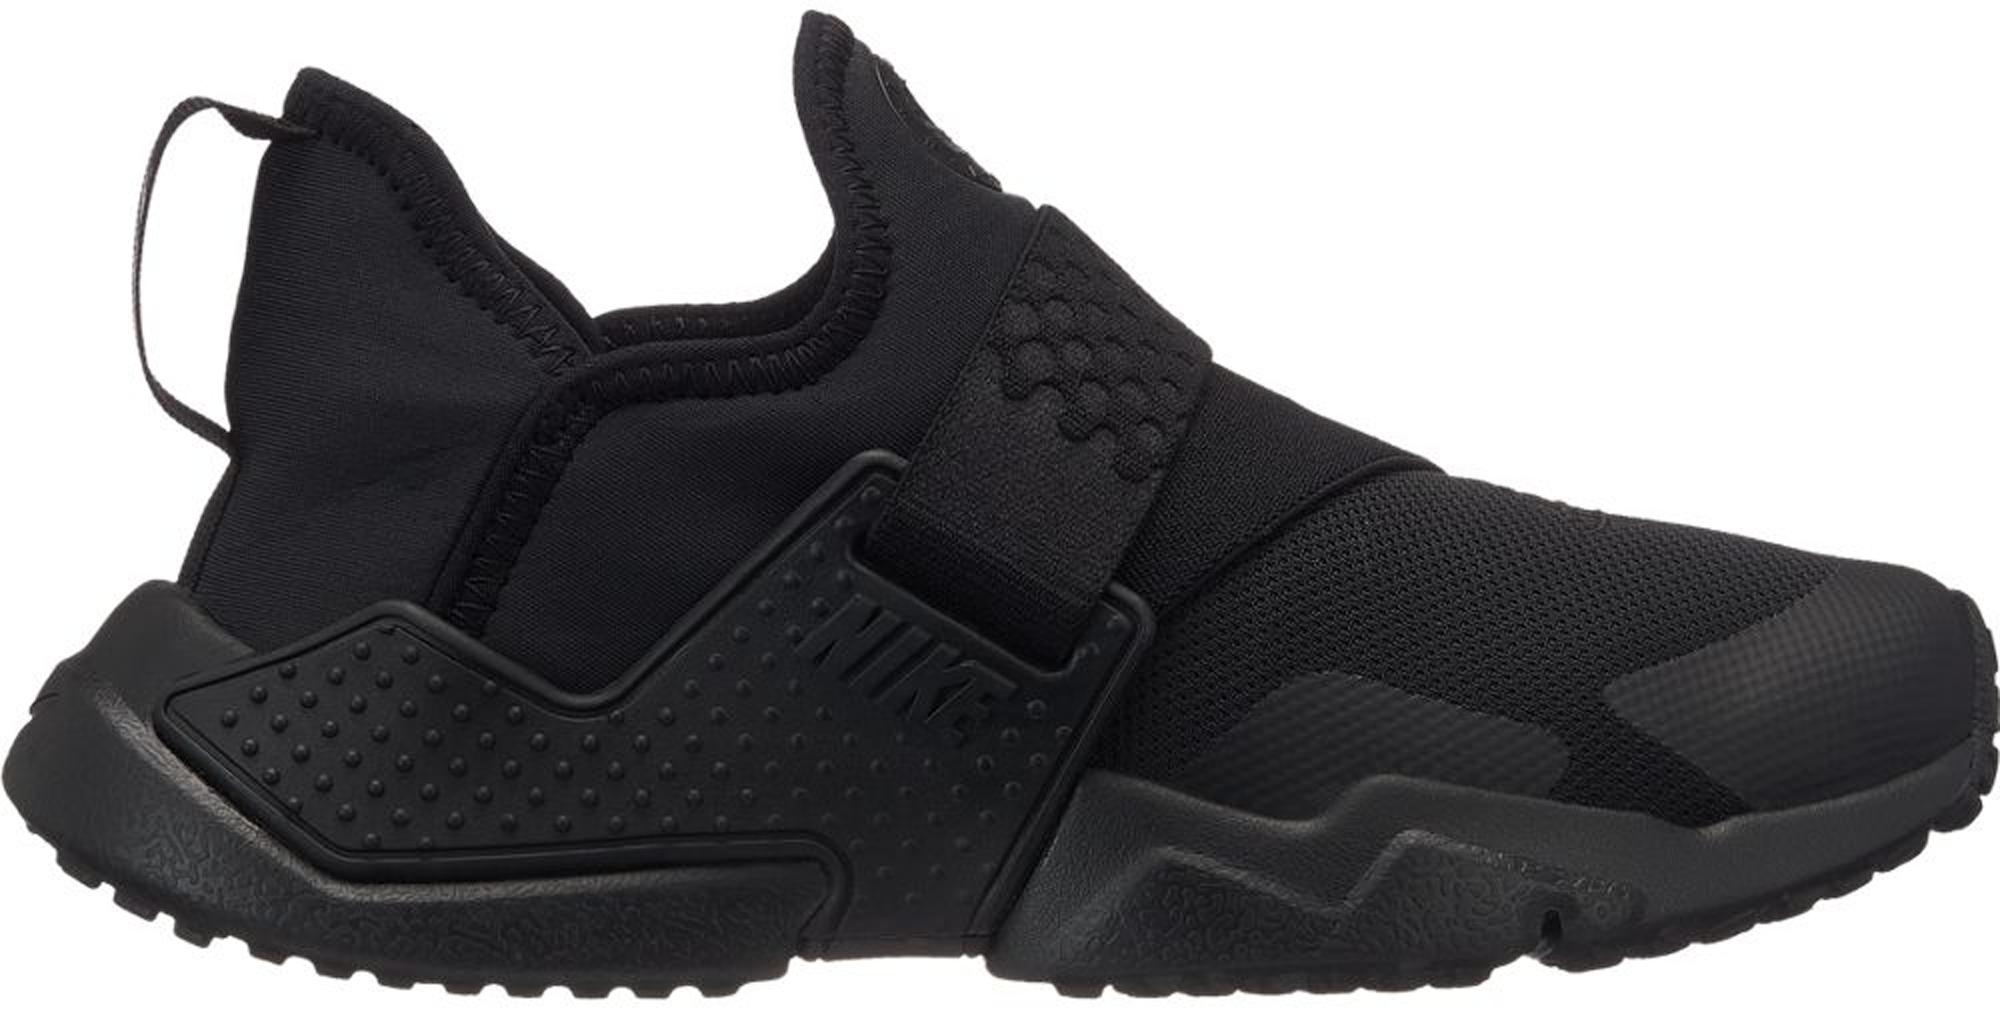 Nike Huarache Extreme Triple Black (GS